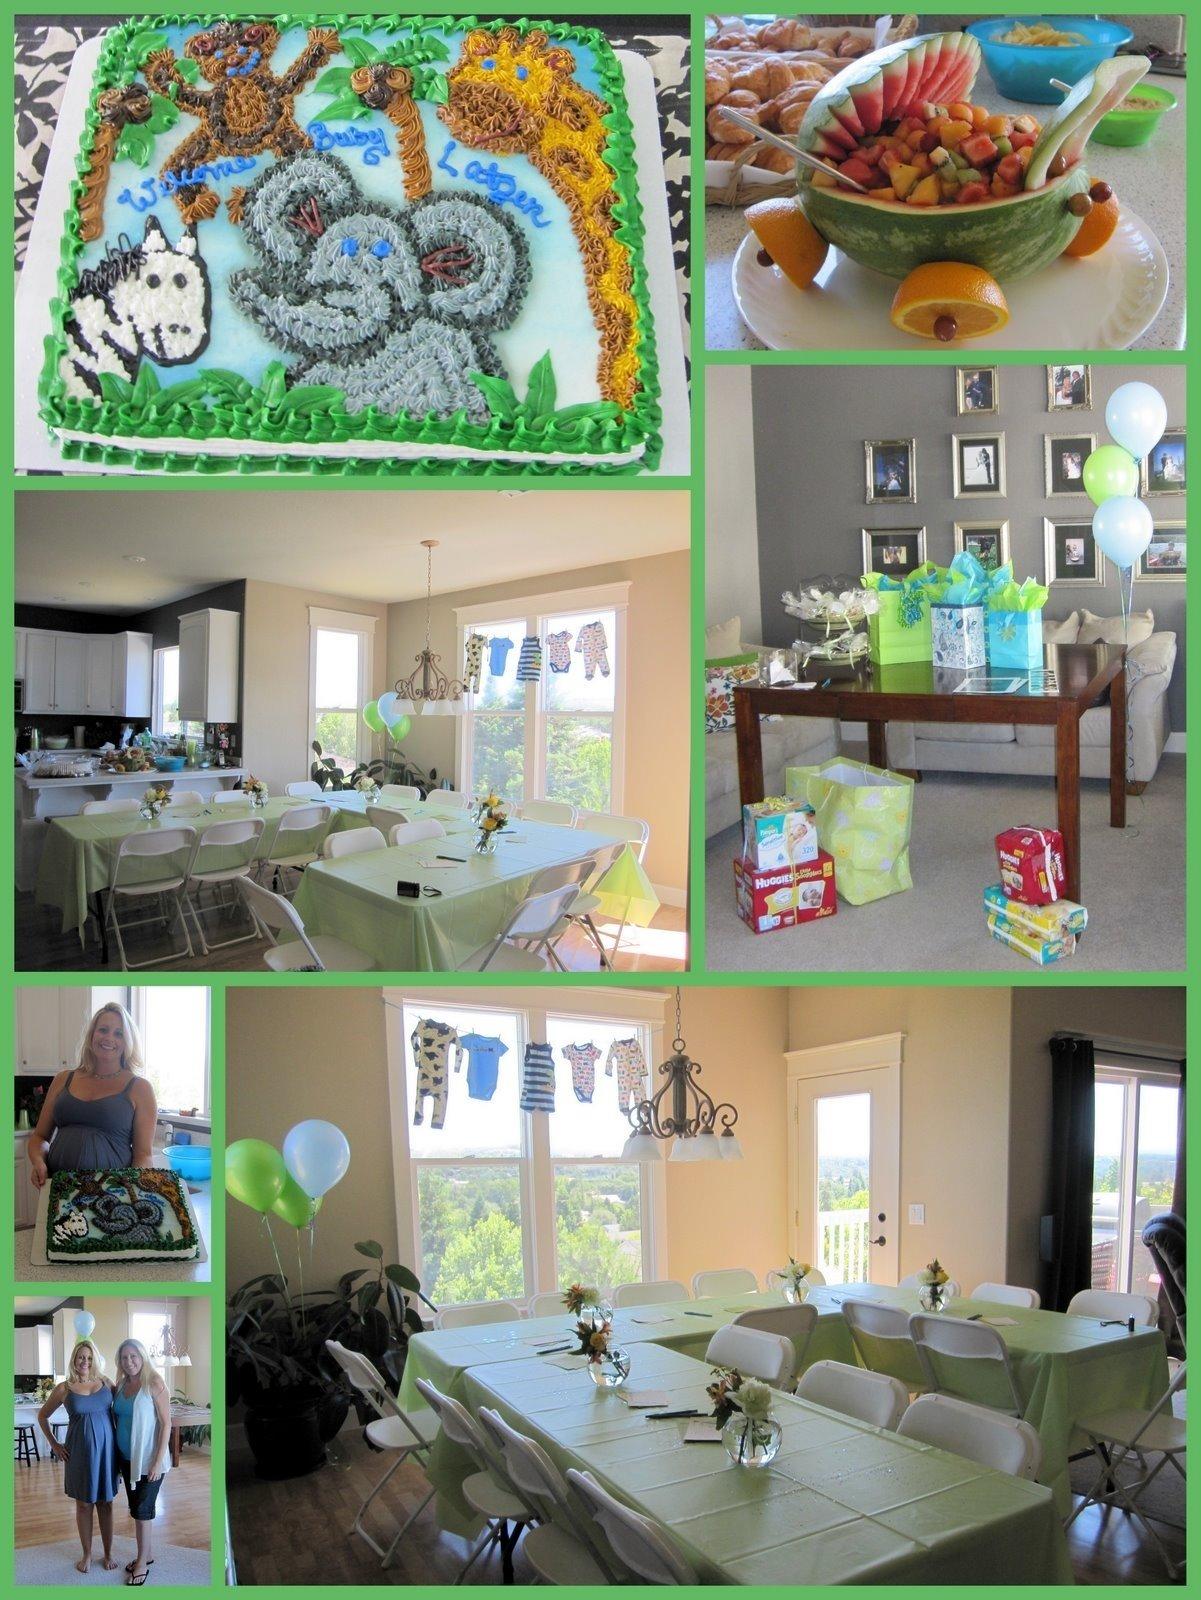 10 Famous Baby Shower Safari Theme Ideas photo jungle theme baby shower ideas image 2020